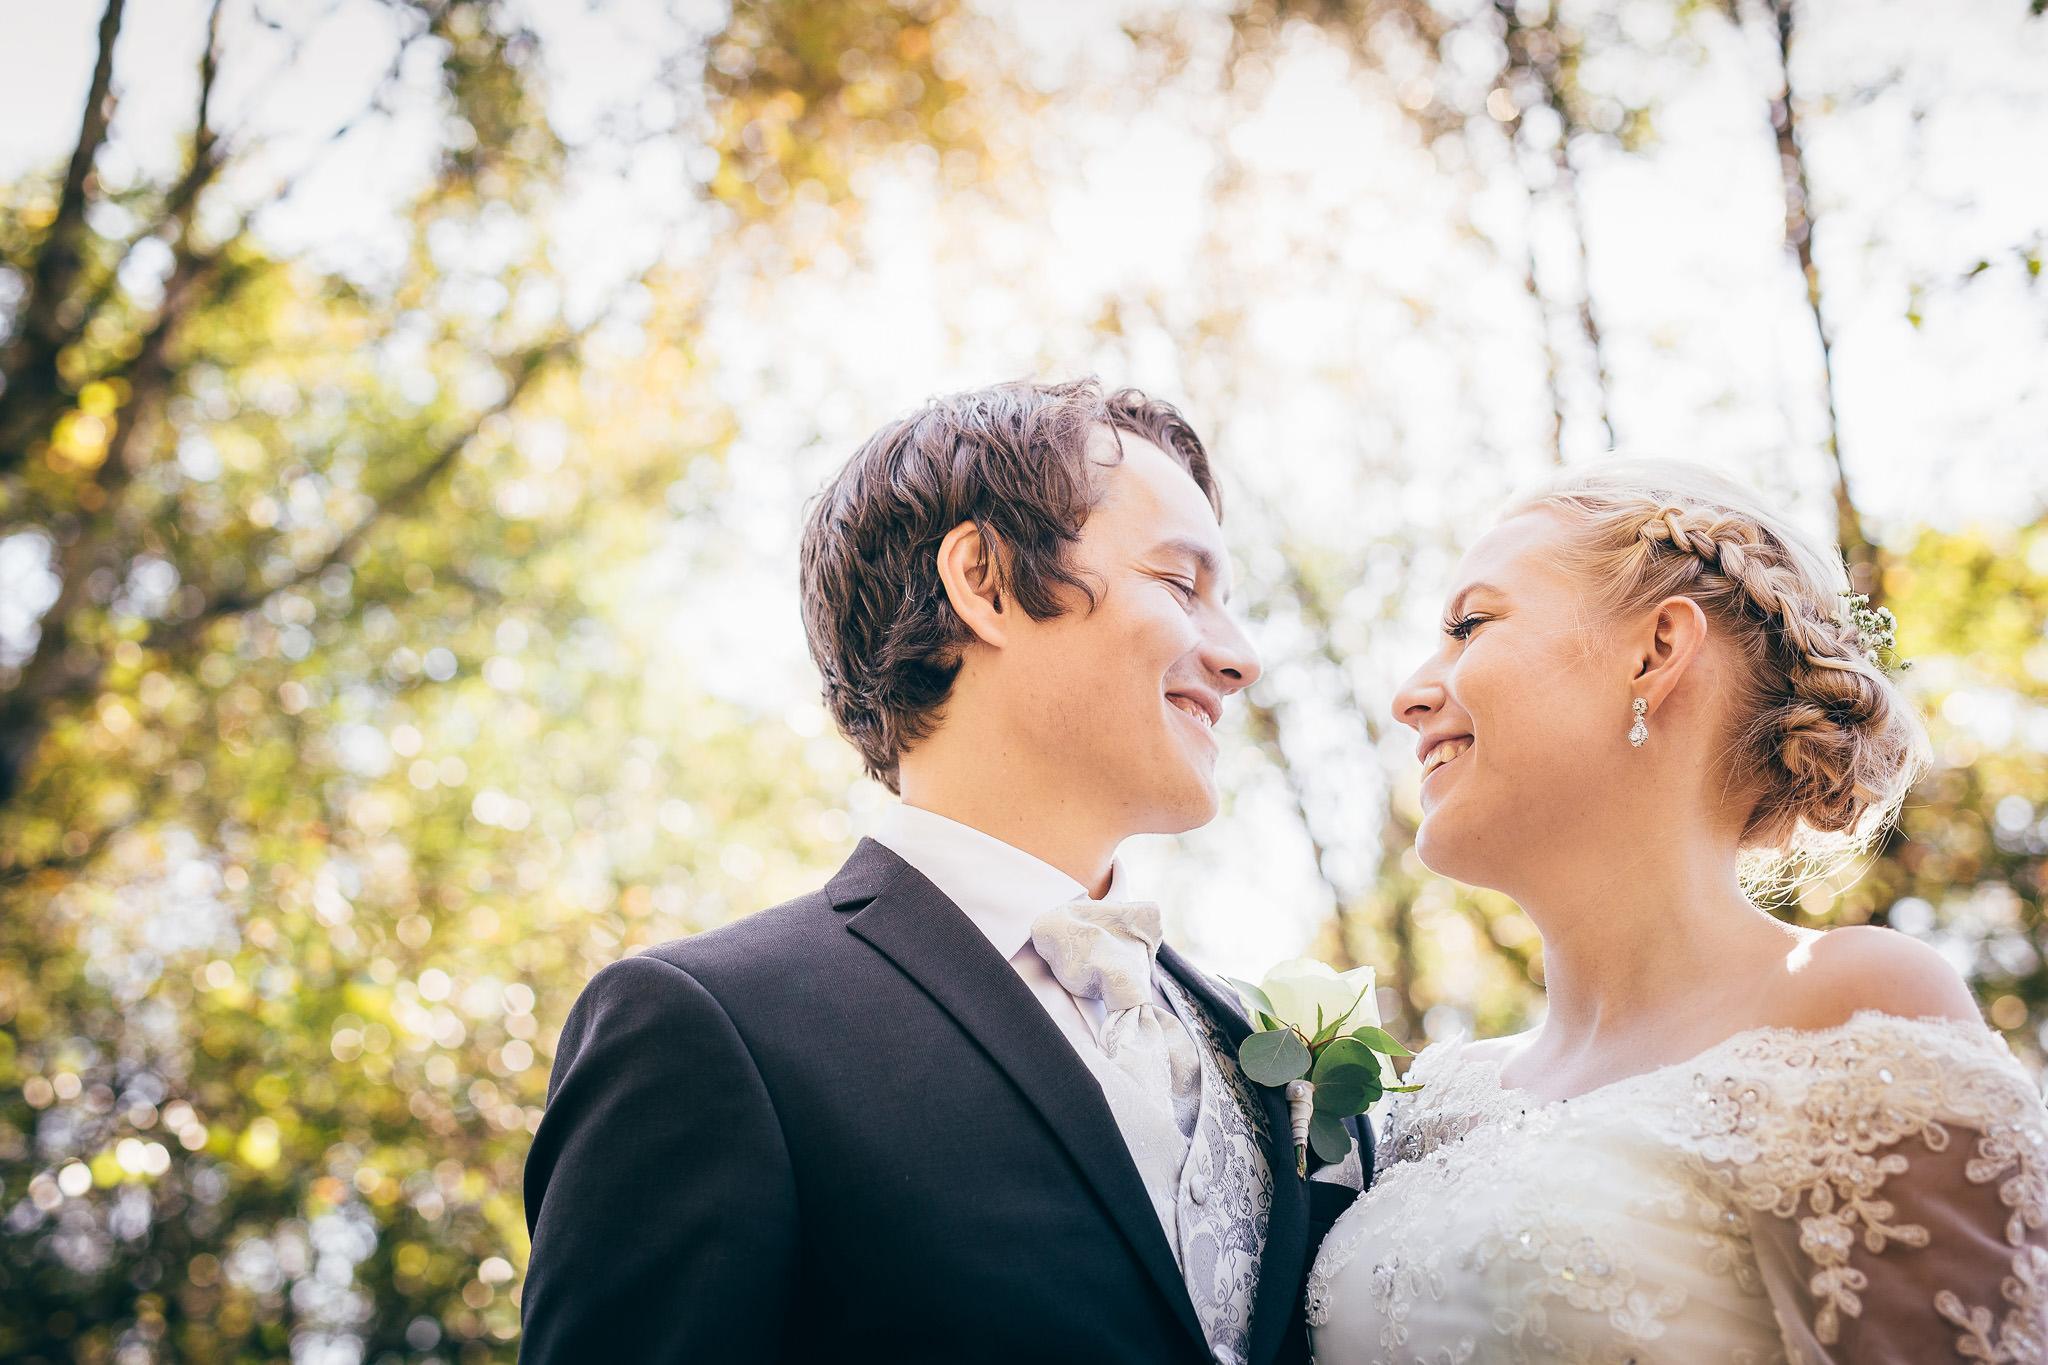 Wedding+Photographer+Norway+Bryllupsfotograf+Casey+Arneson+JT-89.jpg